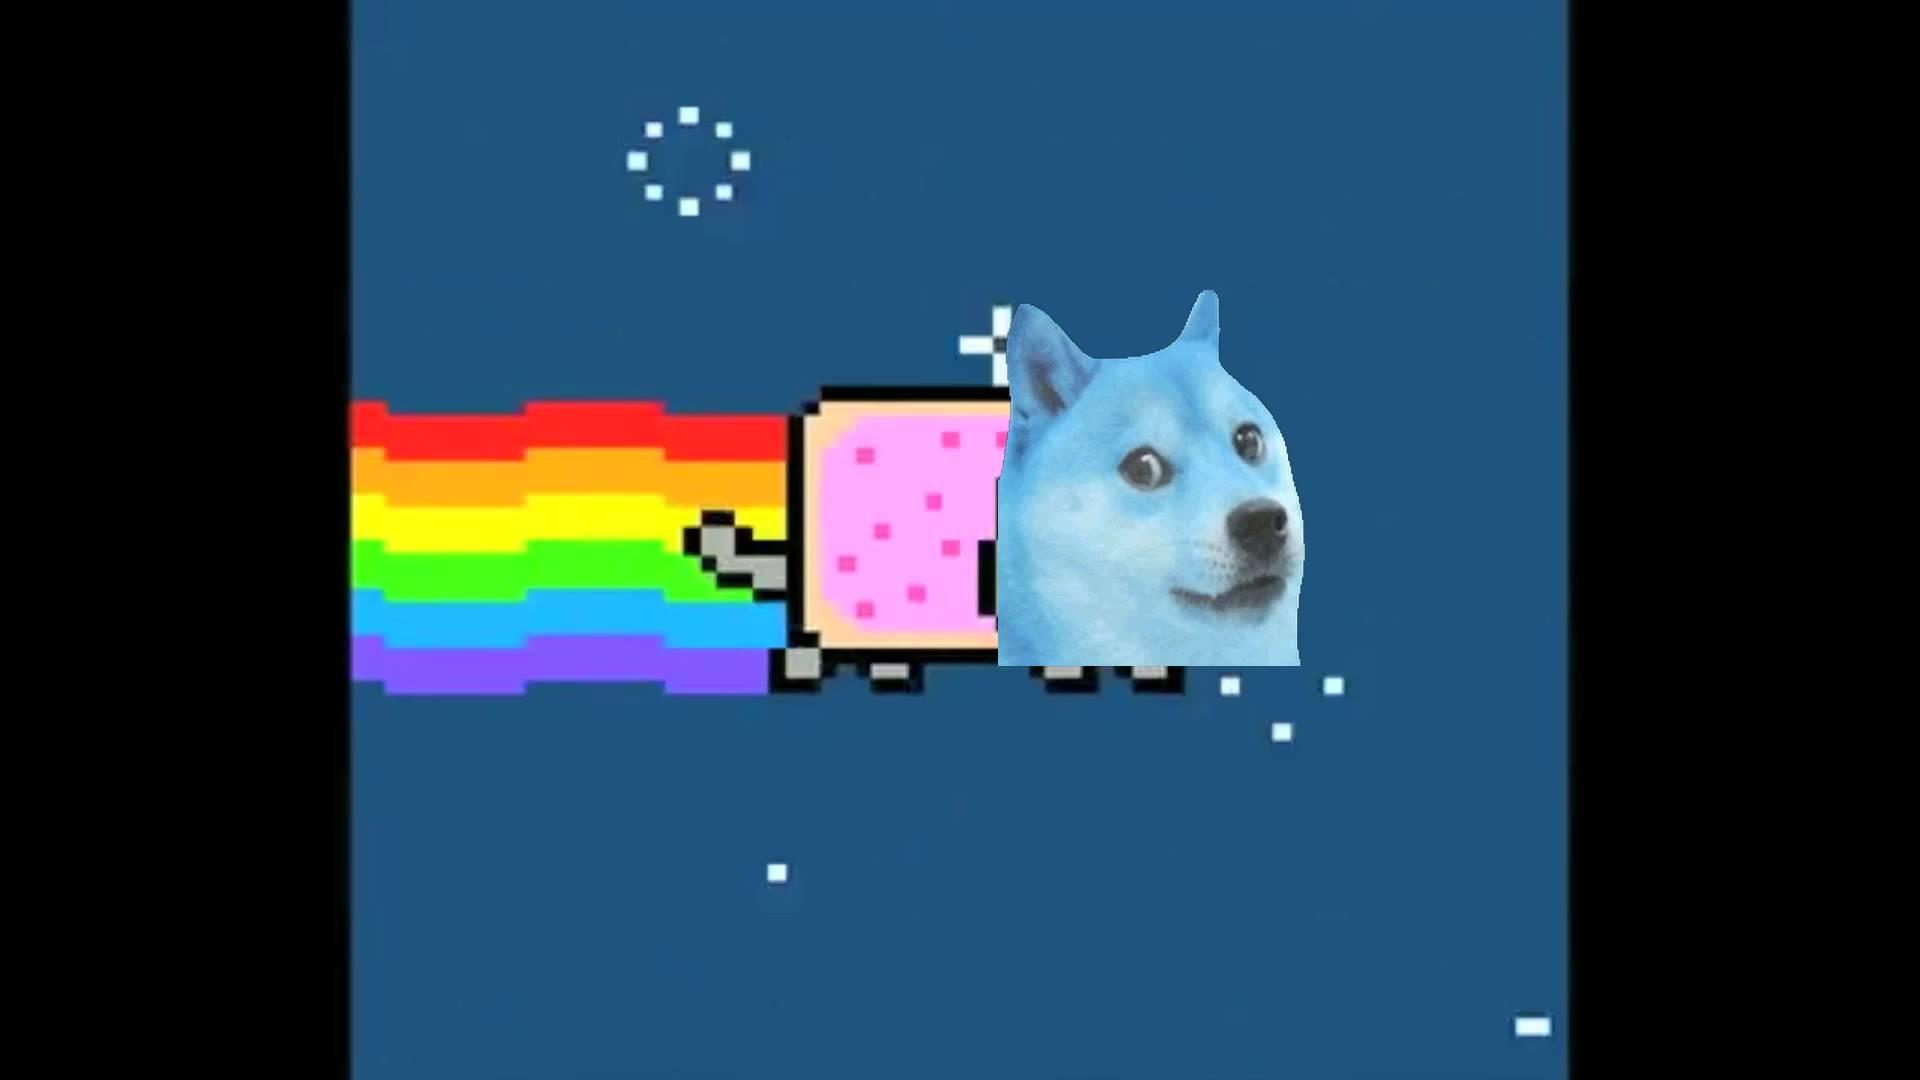 Nyan Space Doge